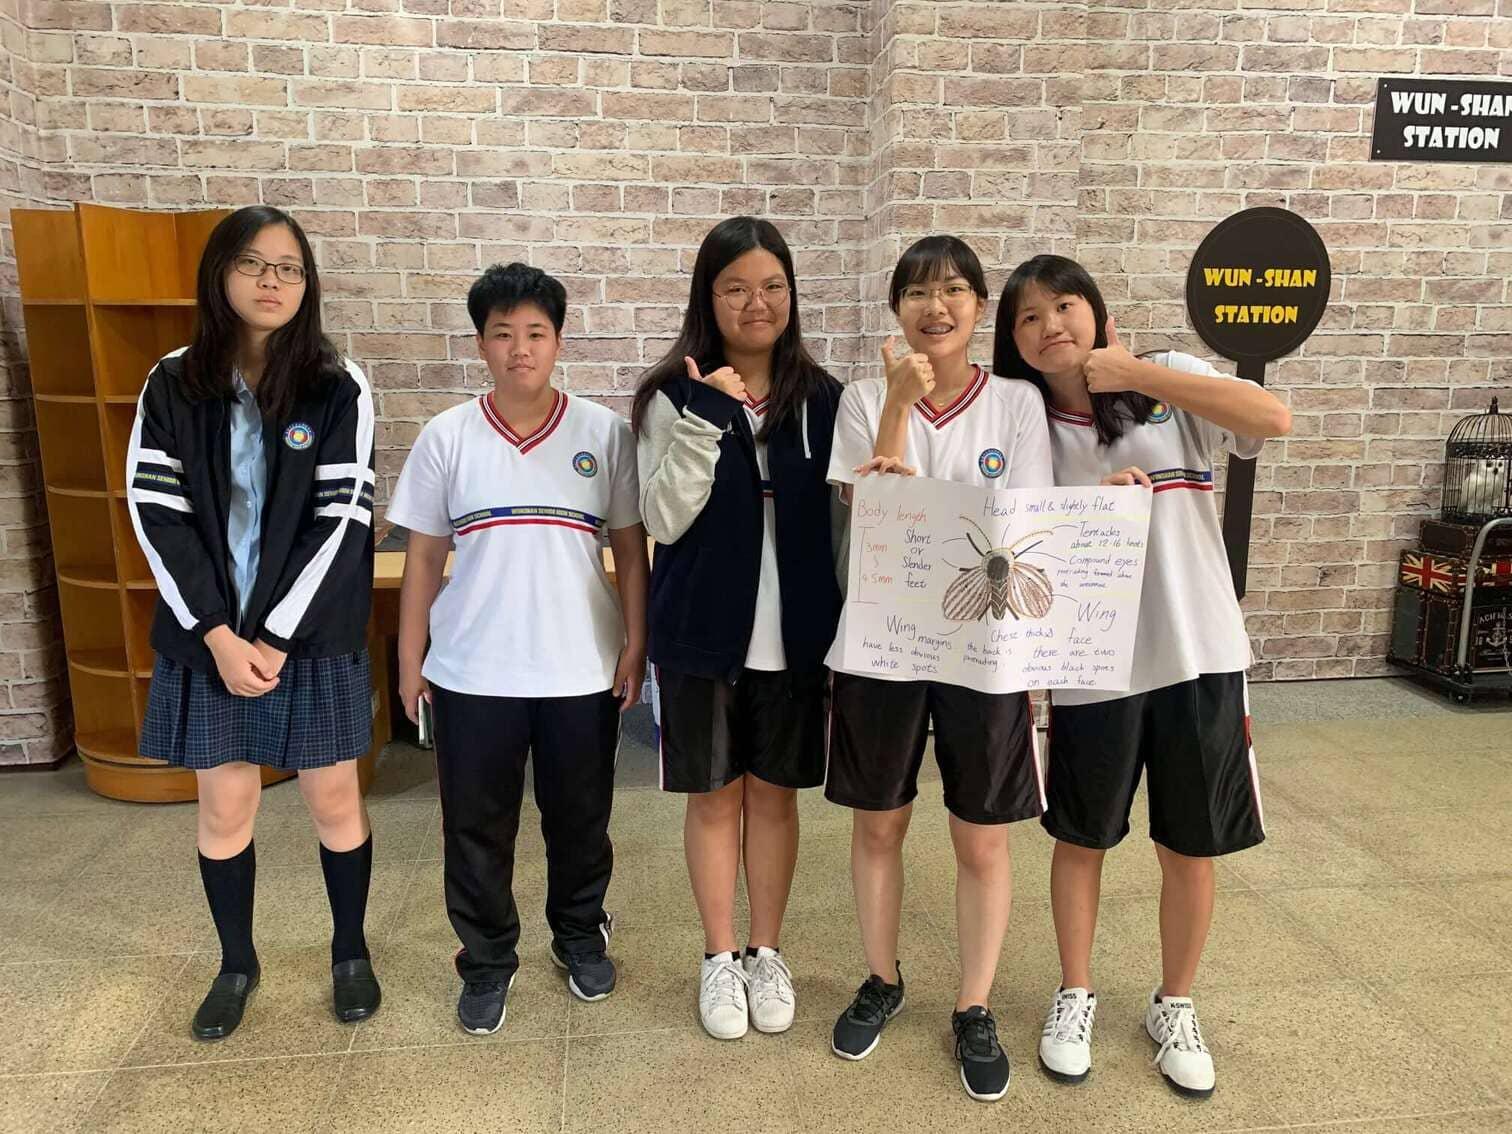 Kaohsiung Municipal Wunshan Senior High School